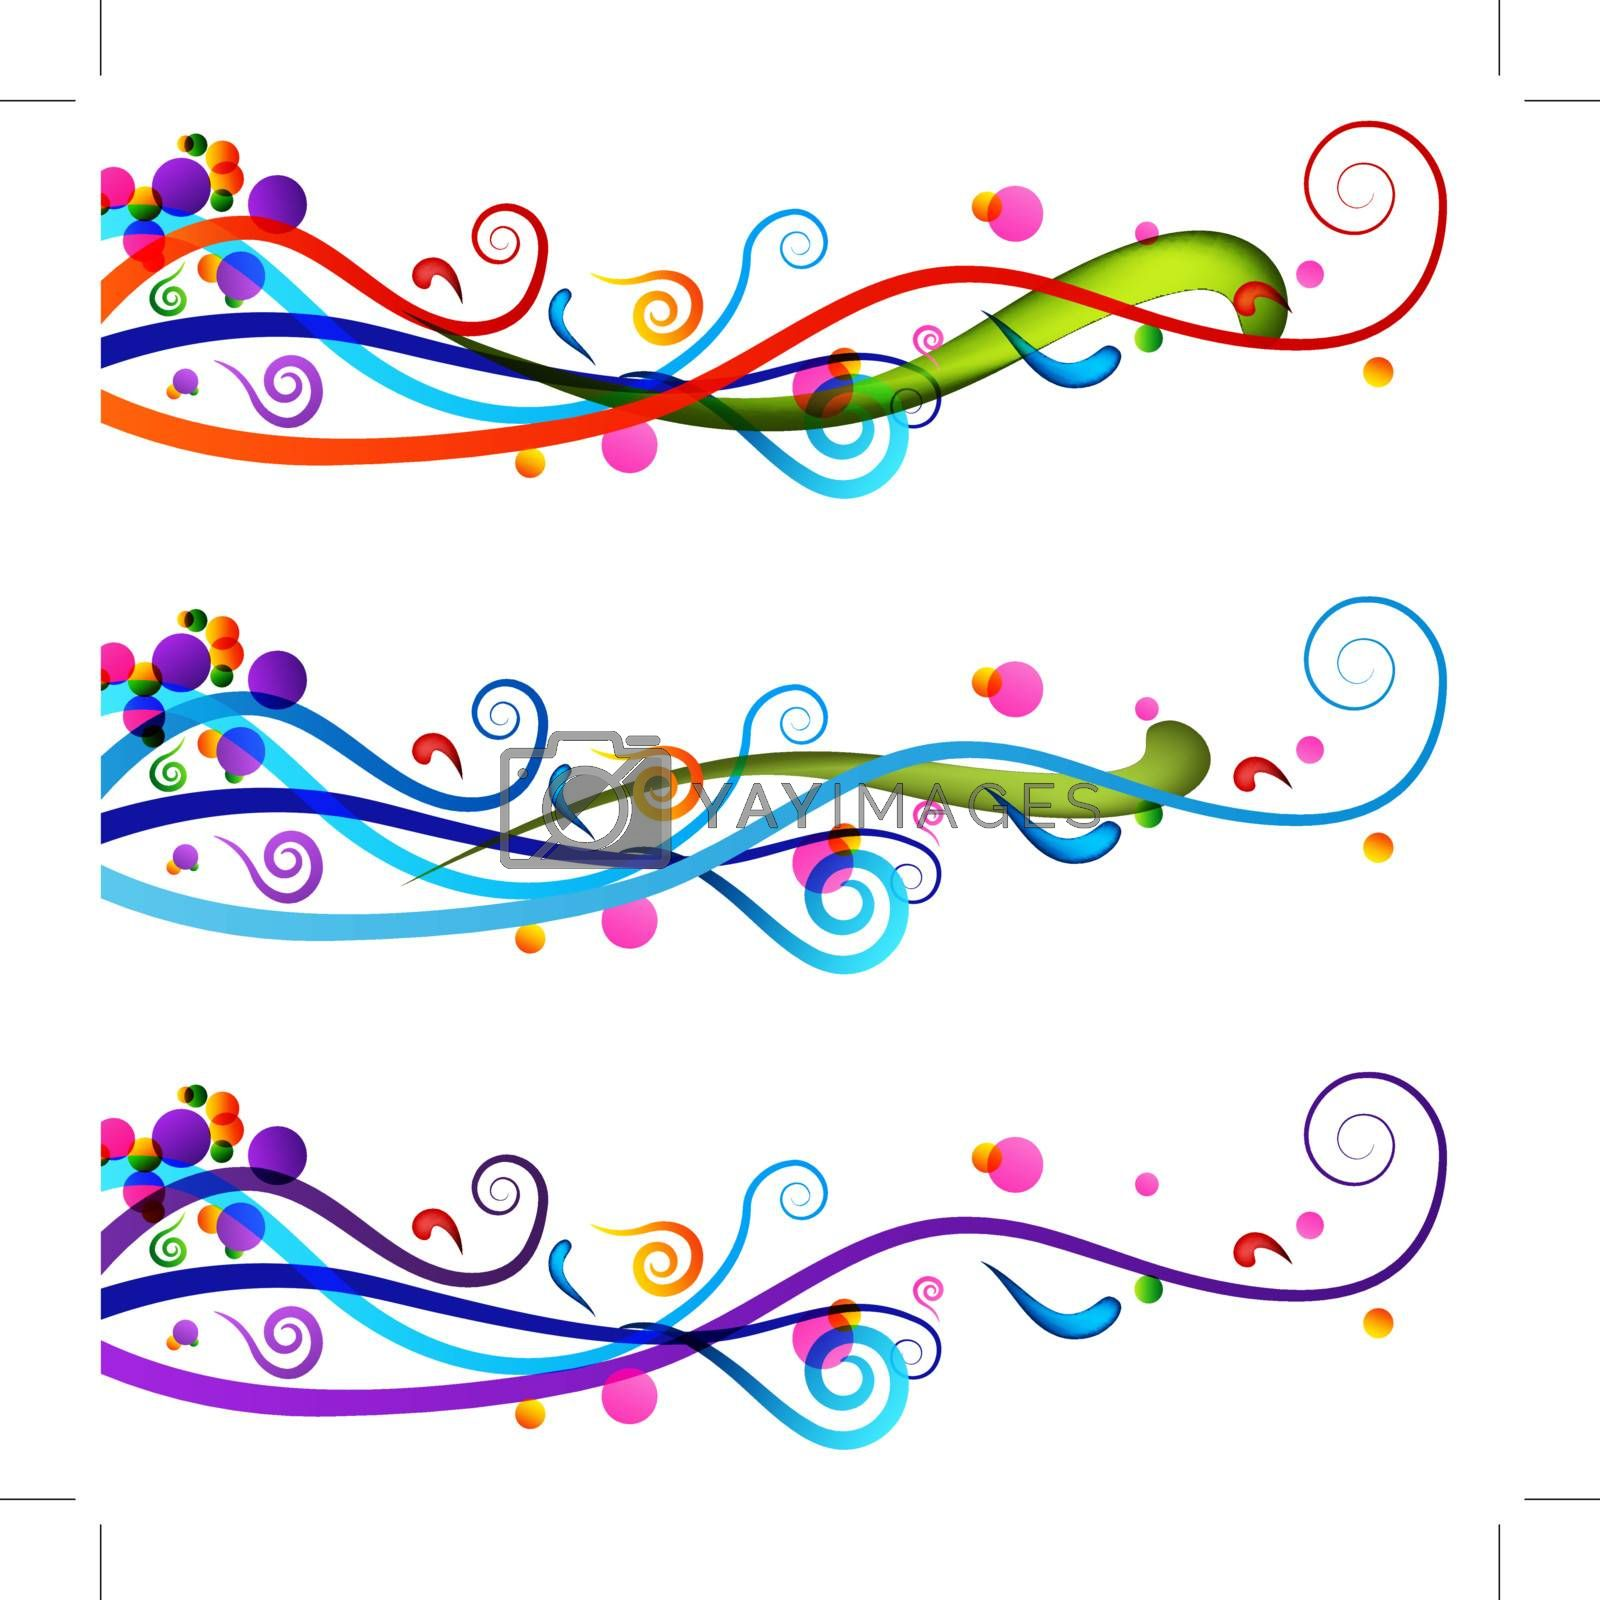 An image of a colorful festive celebration banner set.